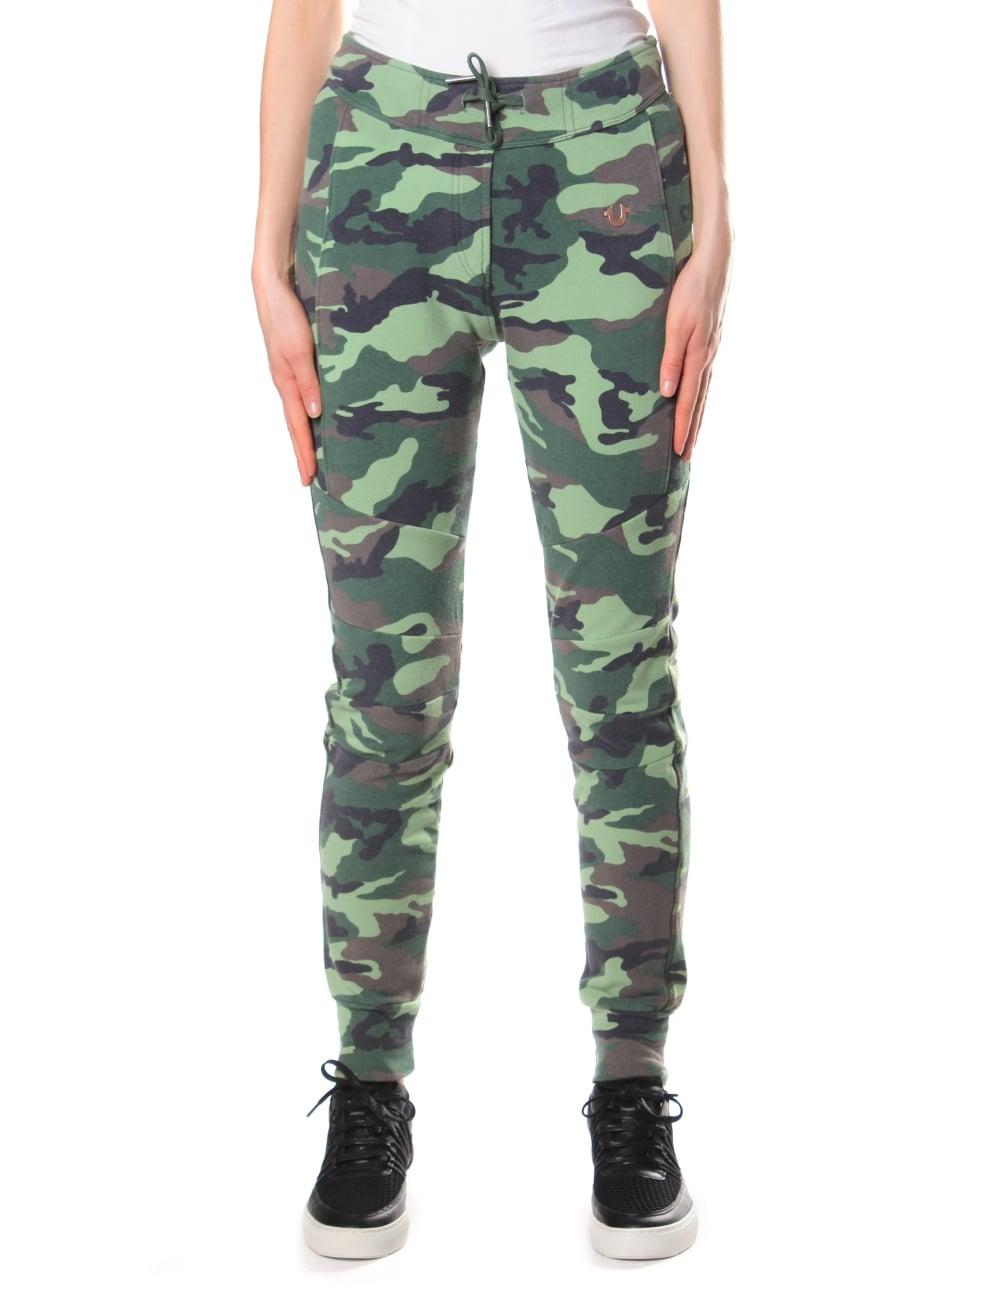 True Religion Women's Camo Sweat Pants